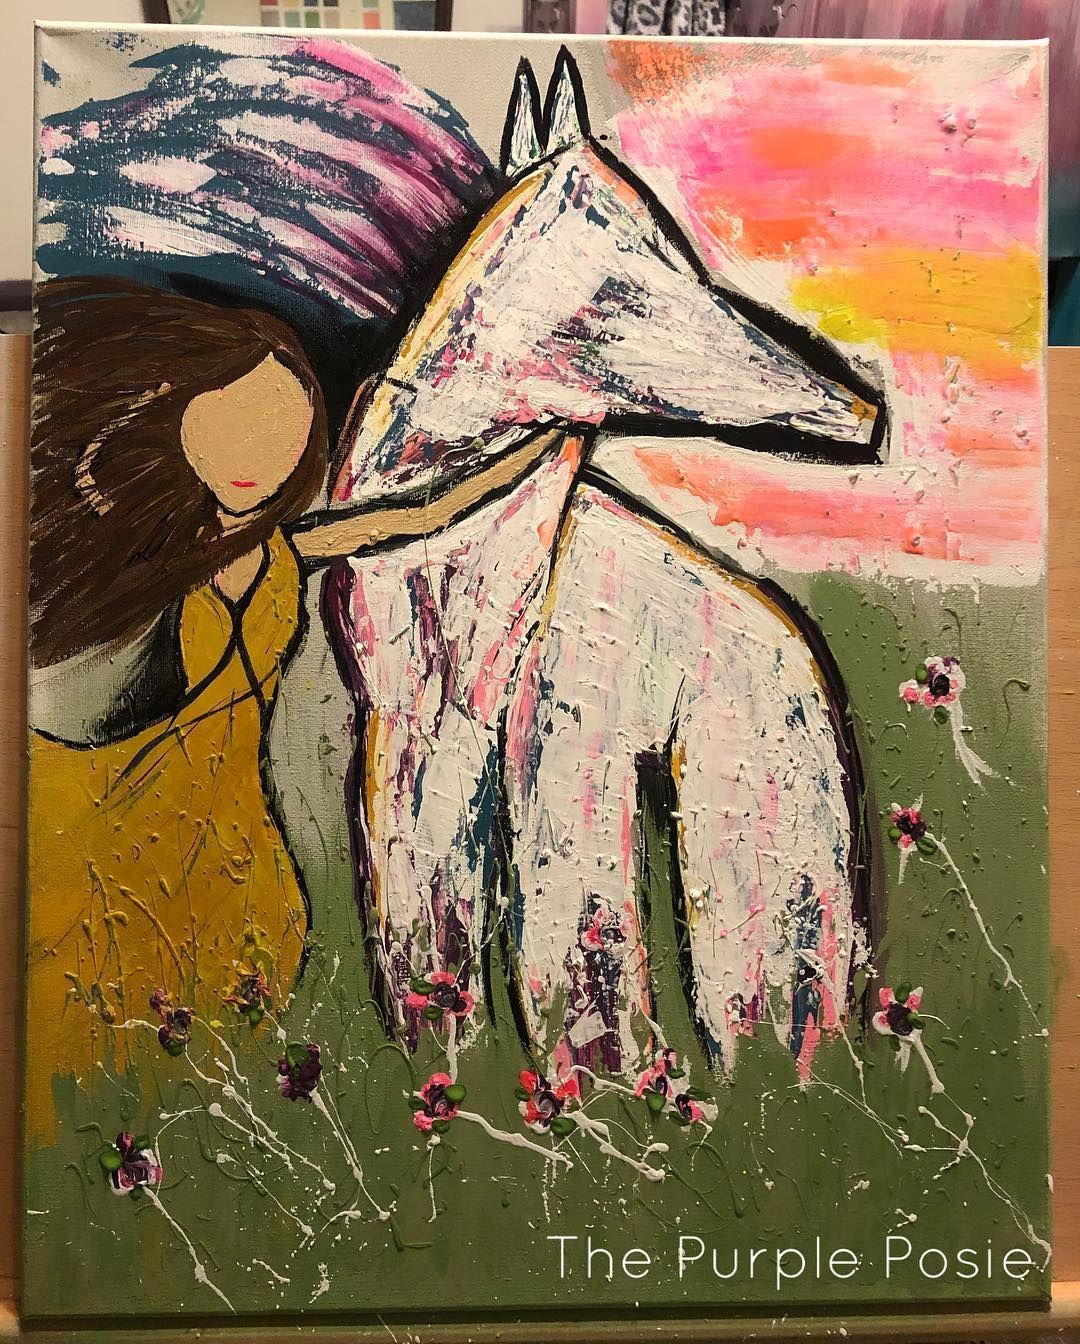 Not too bad for a first timer 🤷🏻♀️💜 #artist #loveart #texasartist #oneofakind #thepurpleposie #handpainted  #createallday #creativeentreprenuer #colormovement #momprenuer #bigspringtexas #westtexasartist